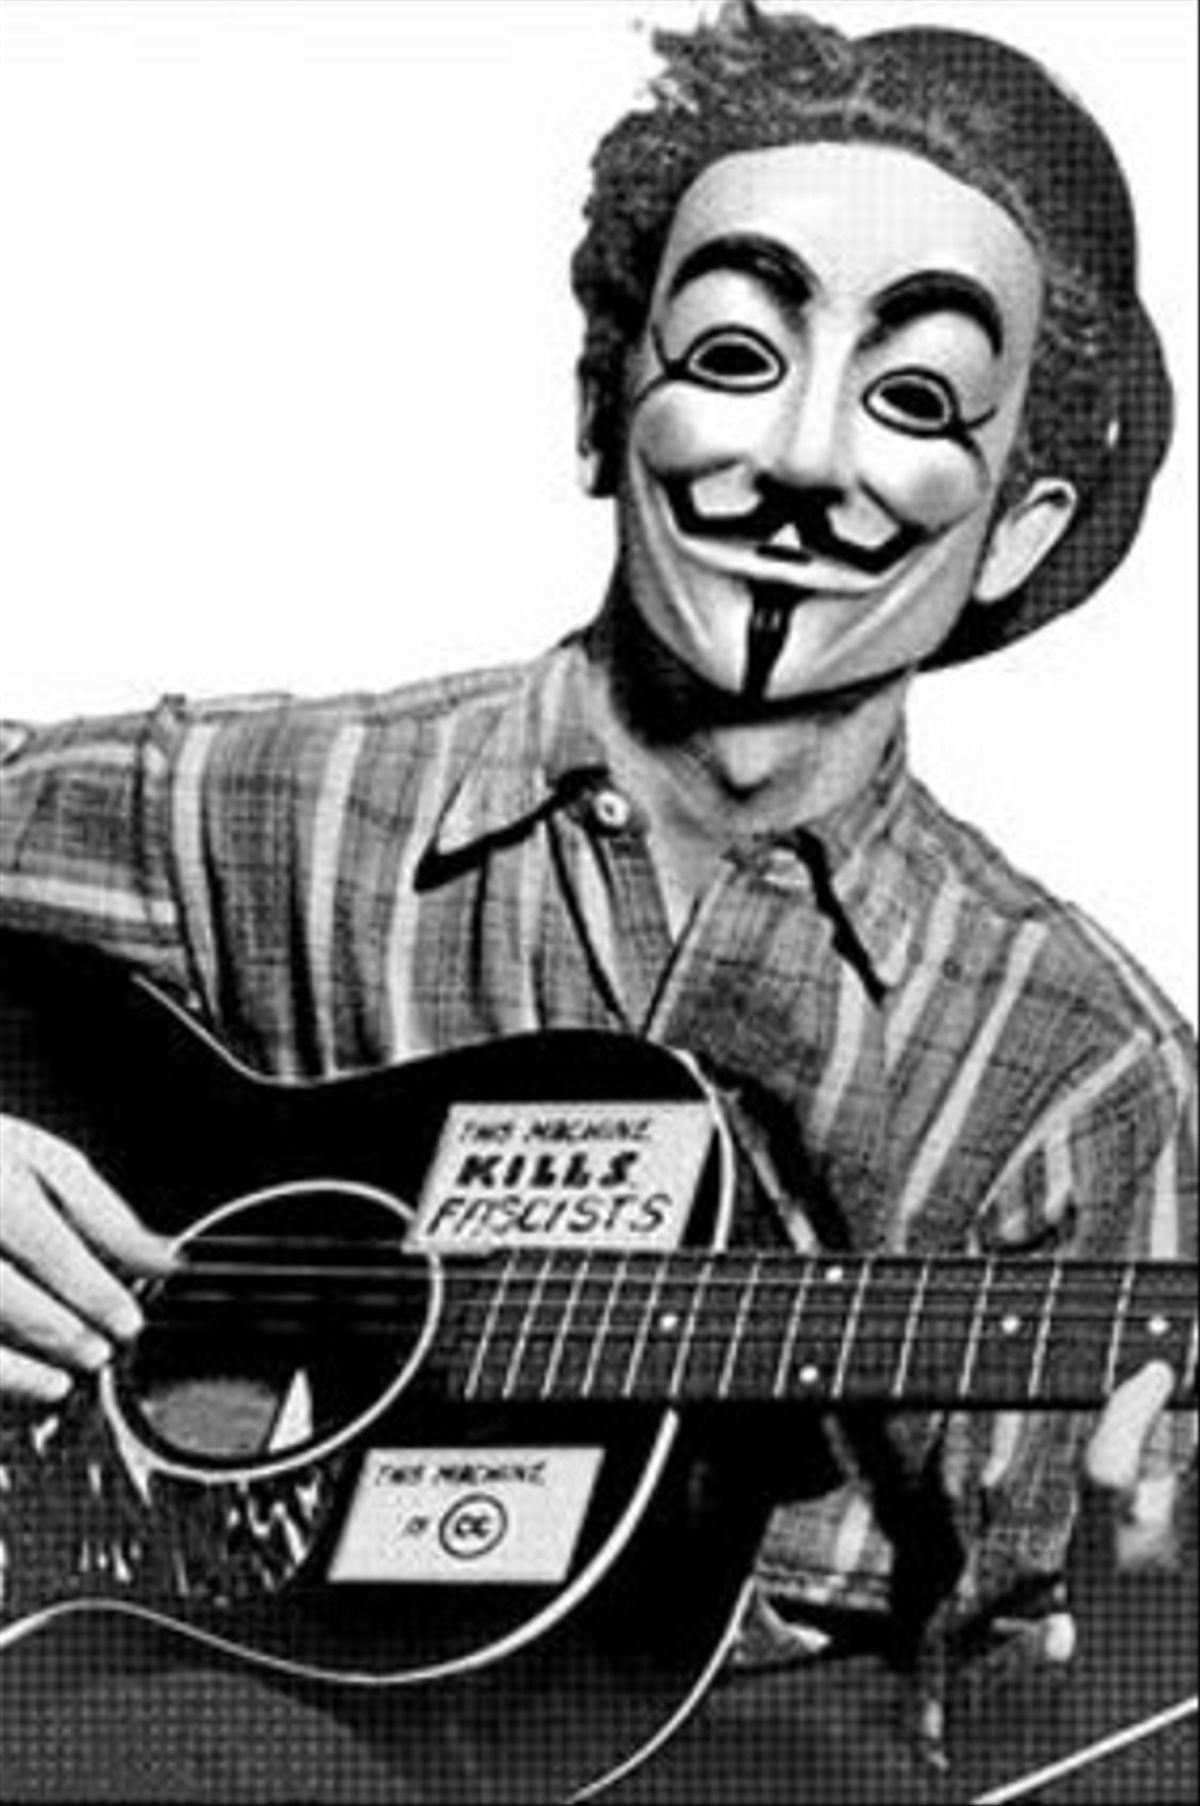 Cantautor enmascarado 8 Estampa actualizada de Woody Guthrie.